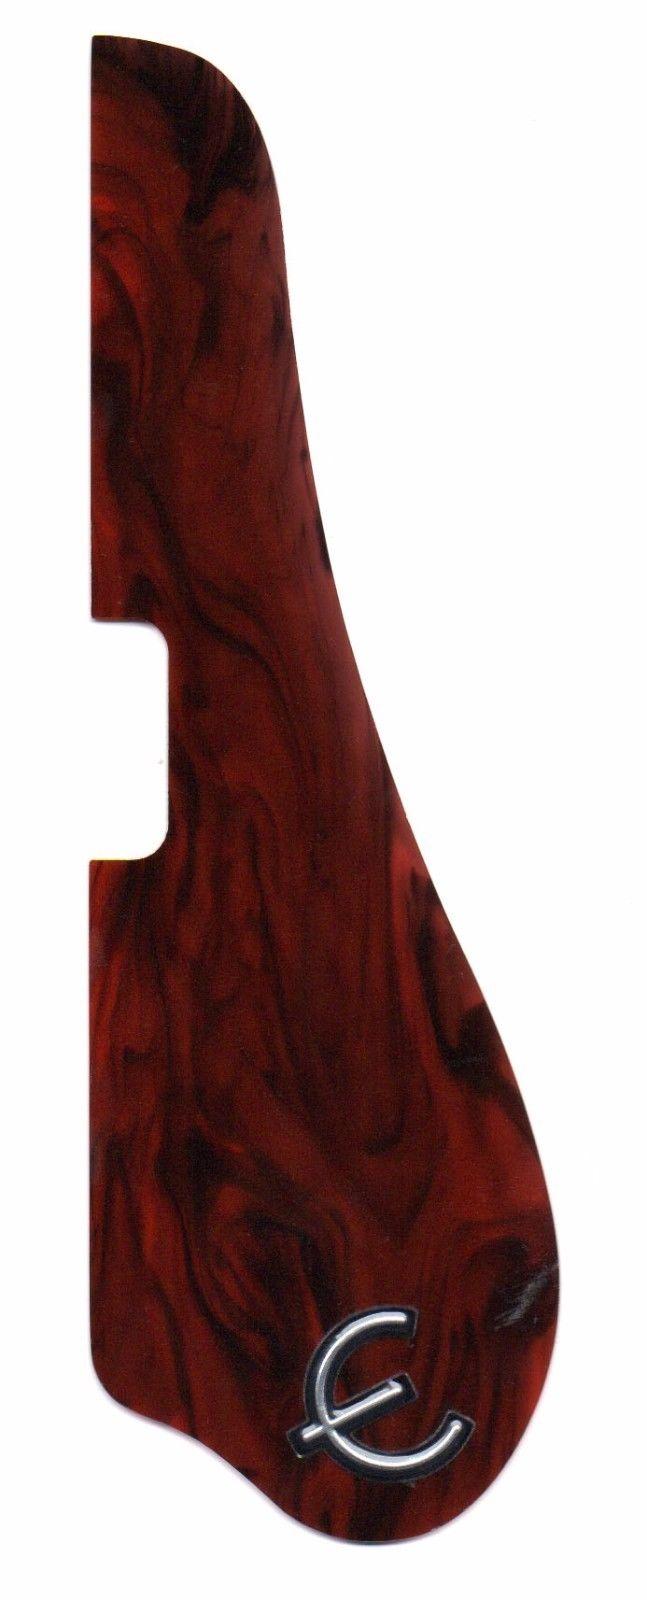 Epiphone Guitar Pickguard